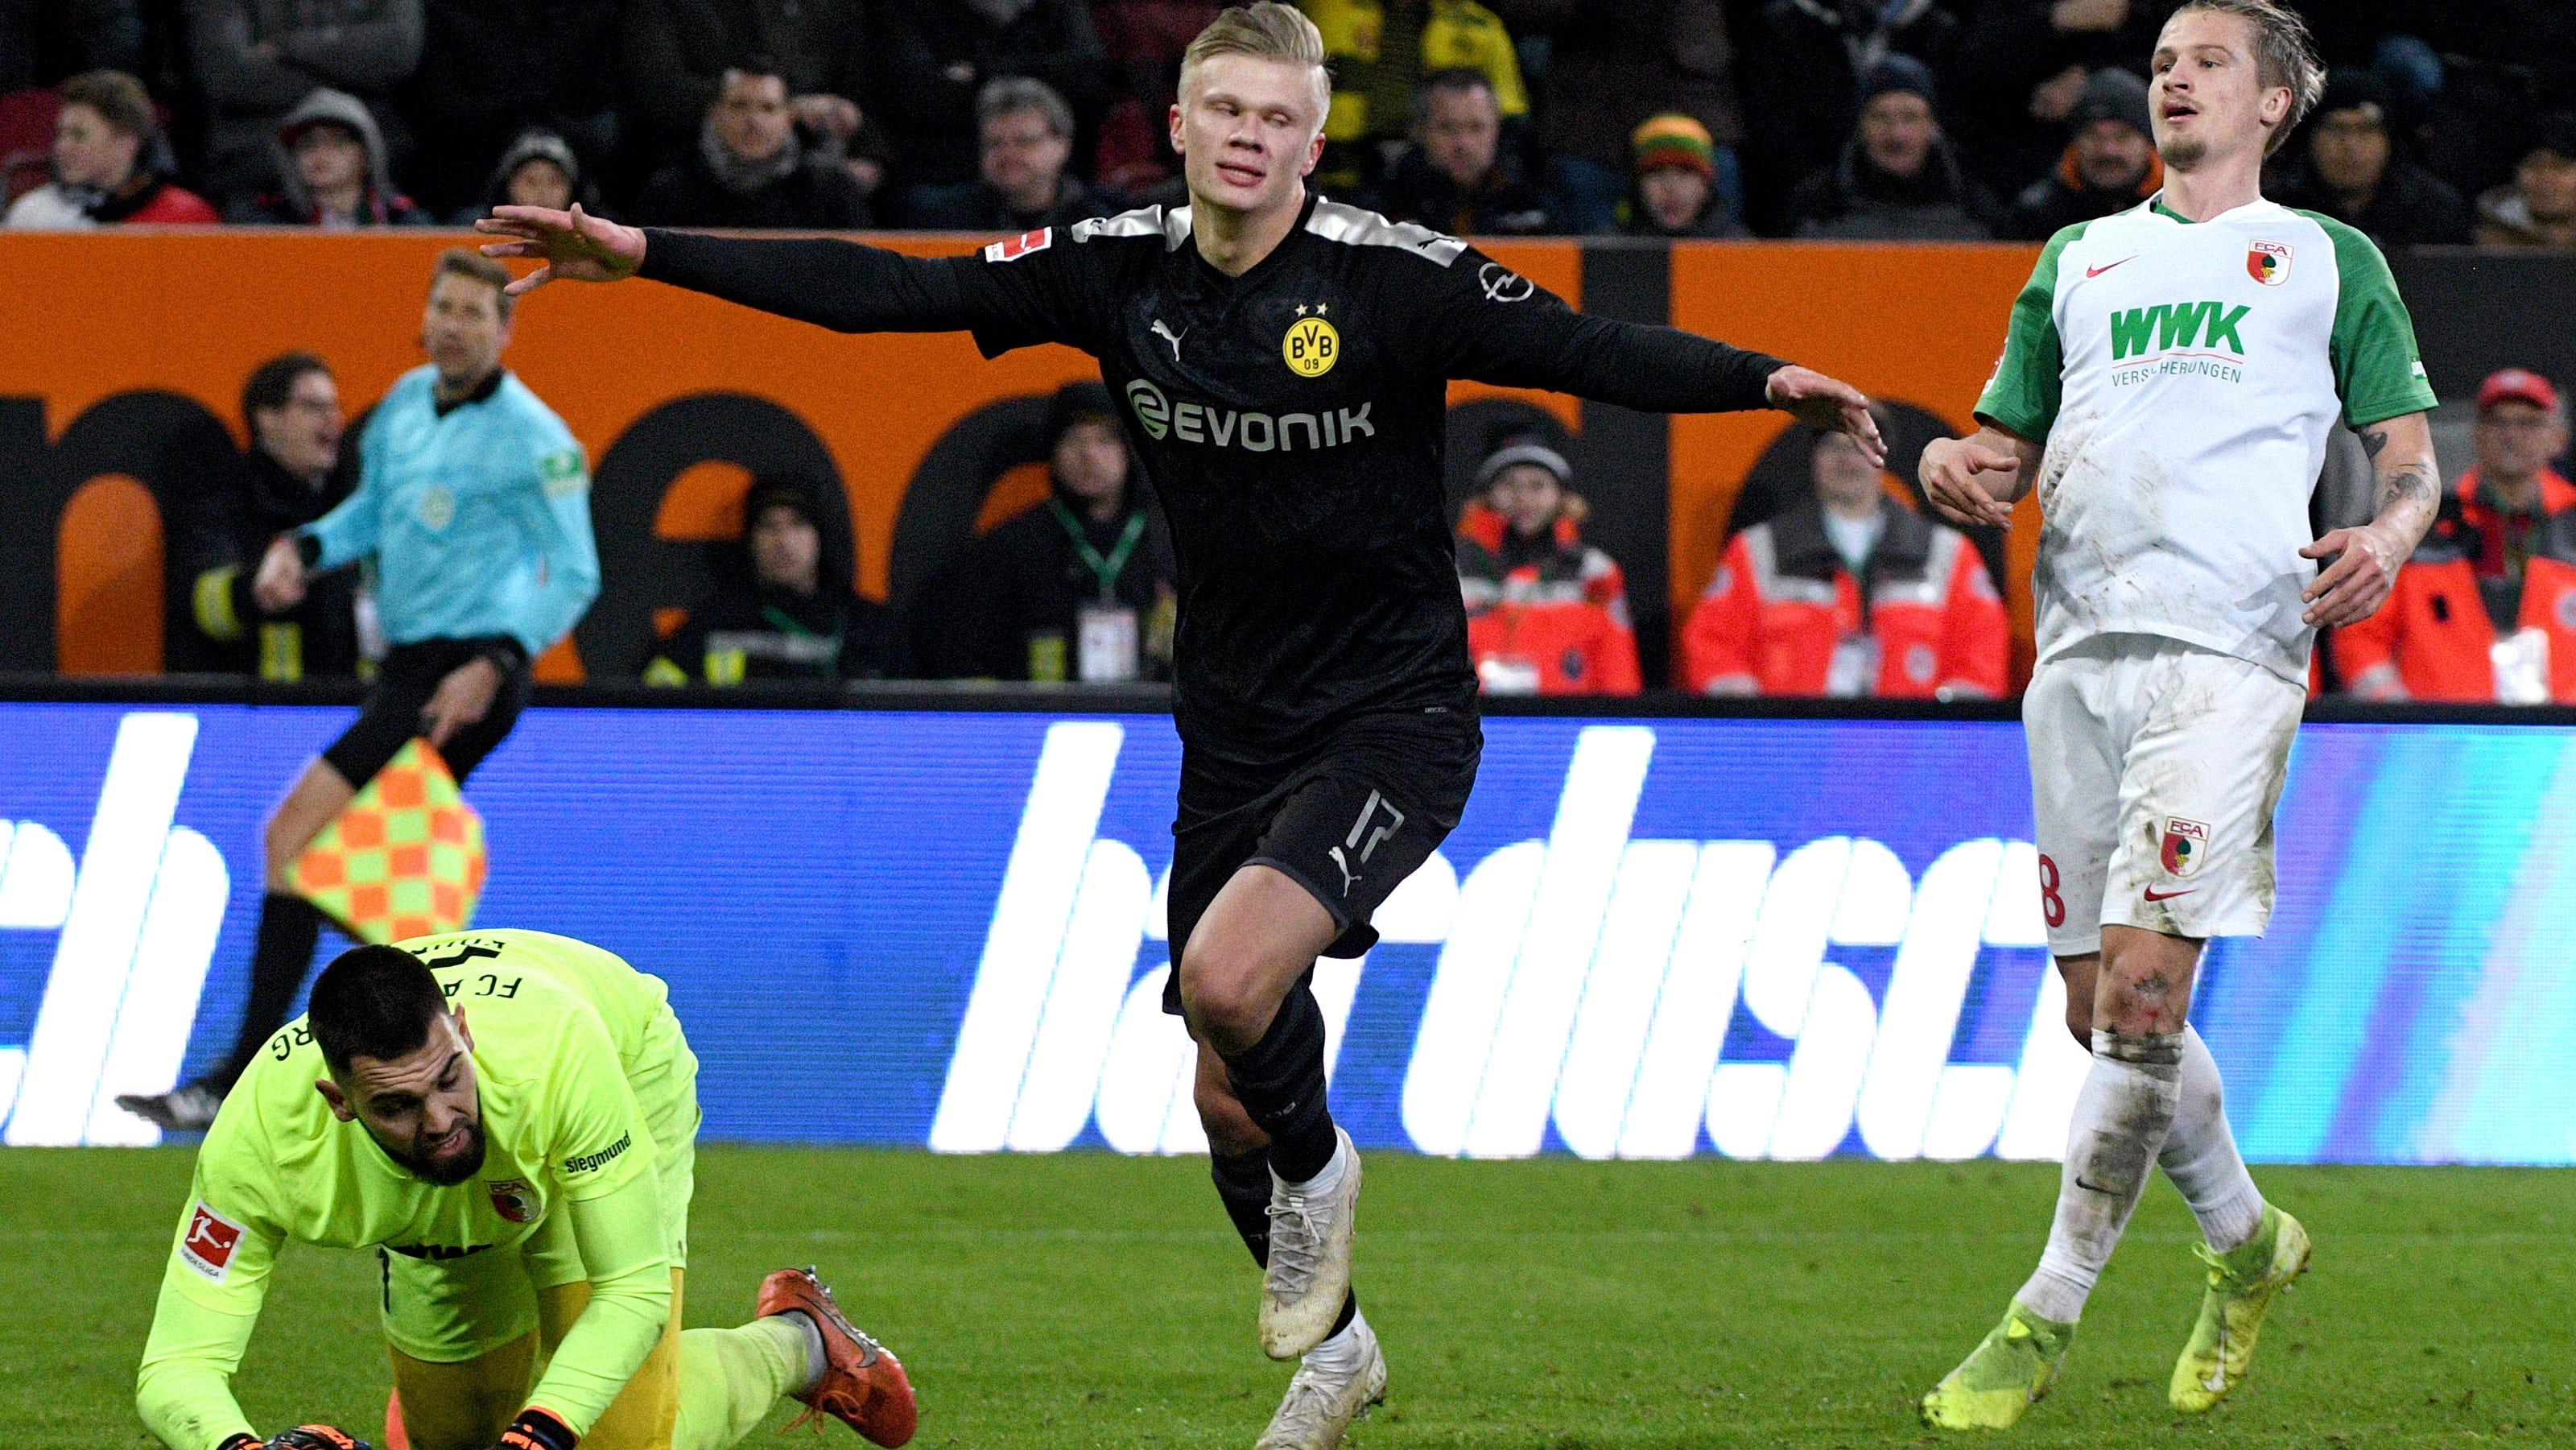 Haaland 19 Scores Hat Trick On Dream Debut For Dortmund